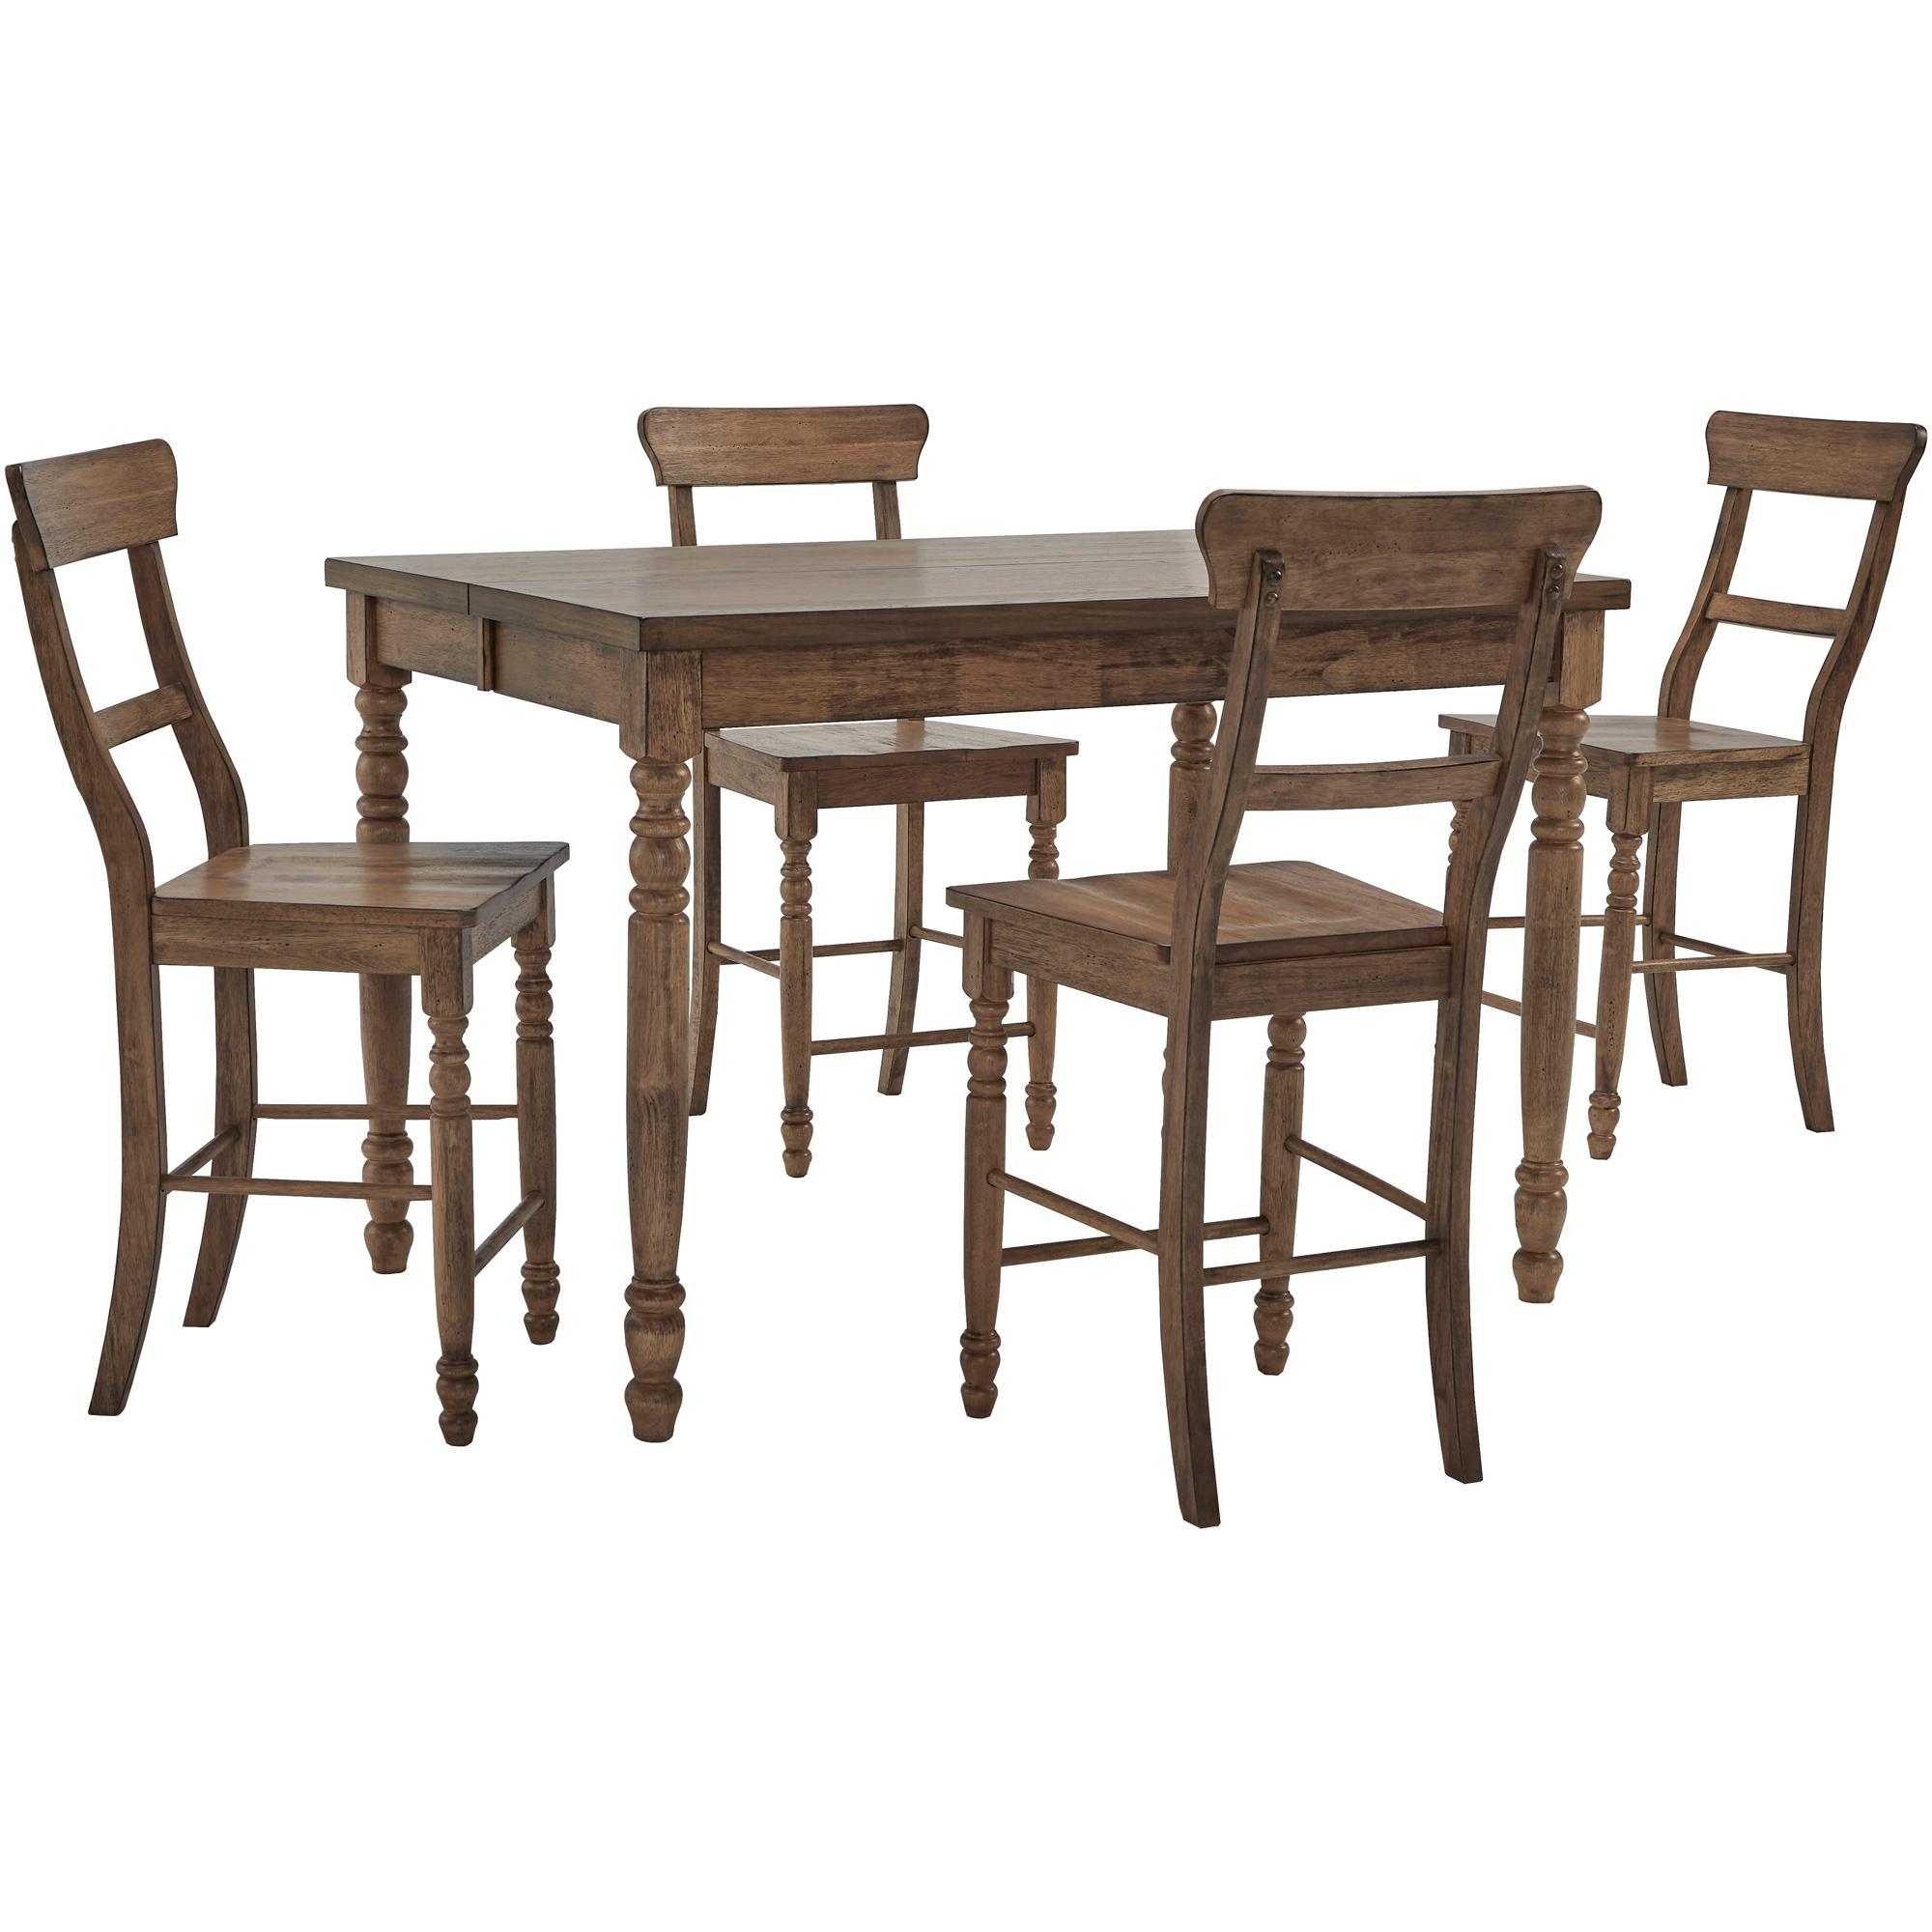 Progressive Furniture Inc. | Savannah Court Antique Oak 5 Piece Counter Dining Set